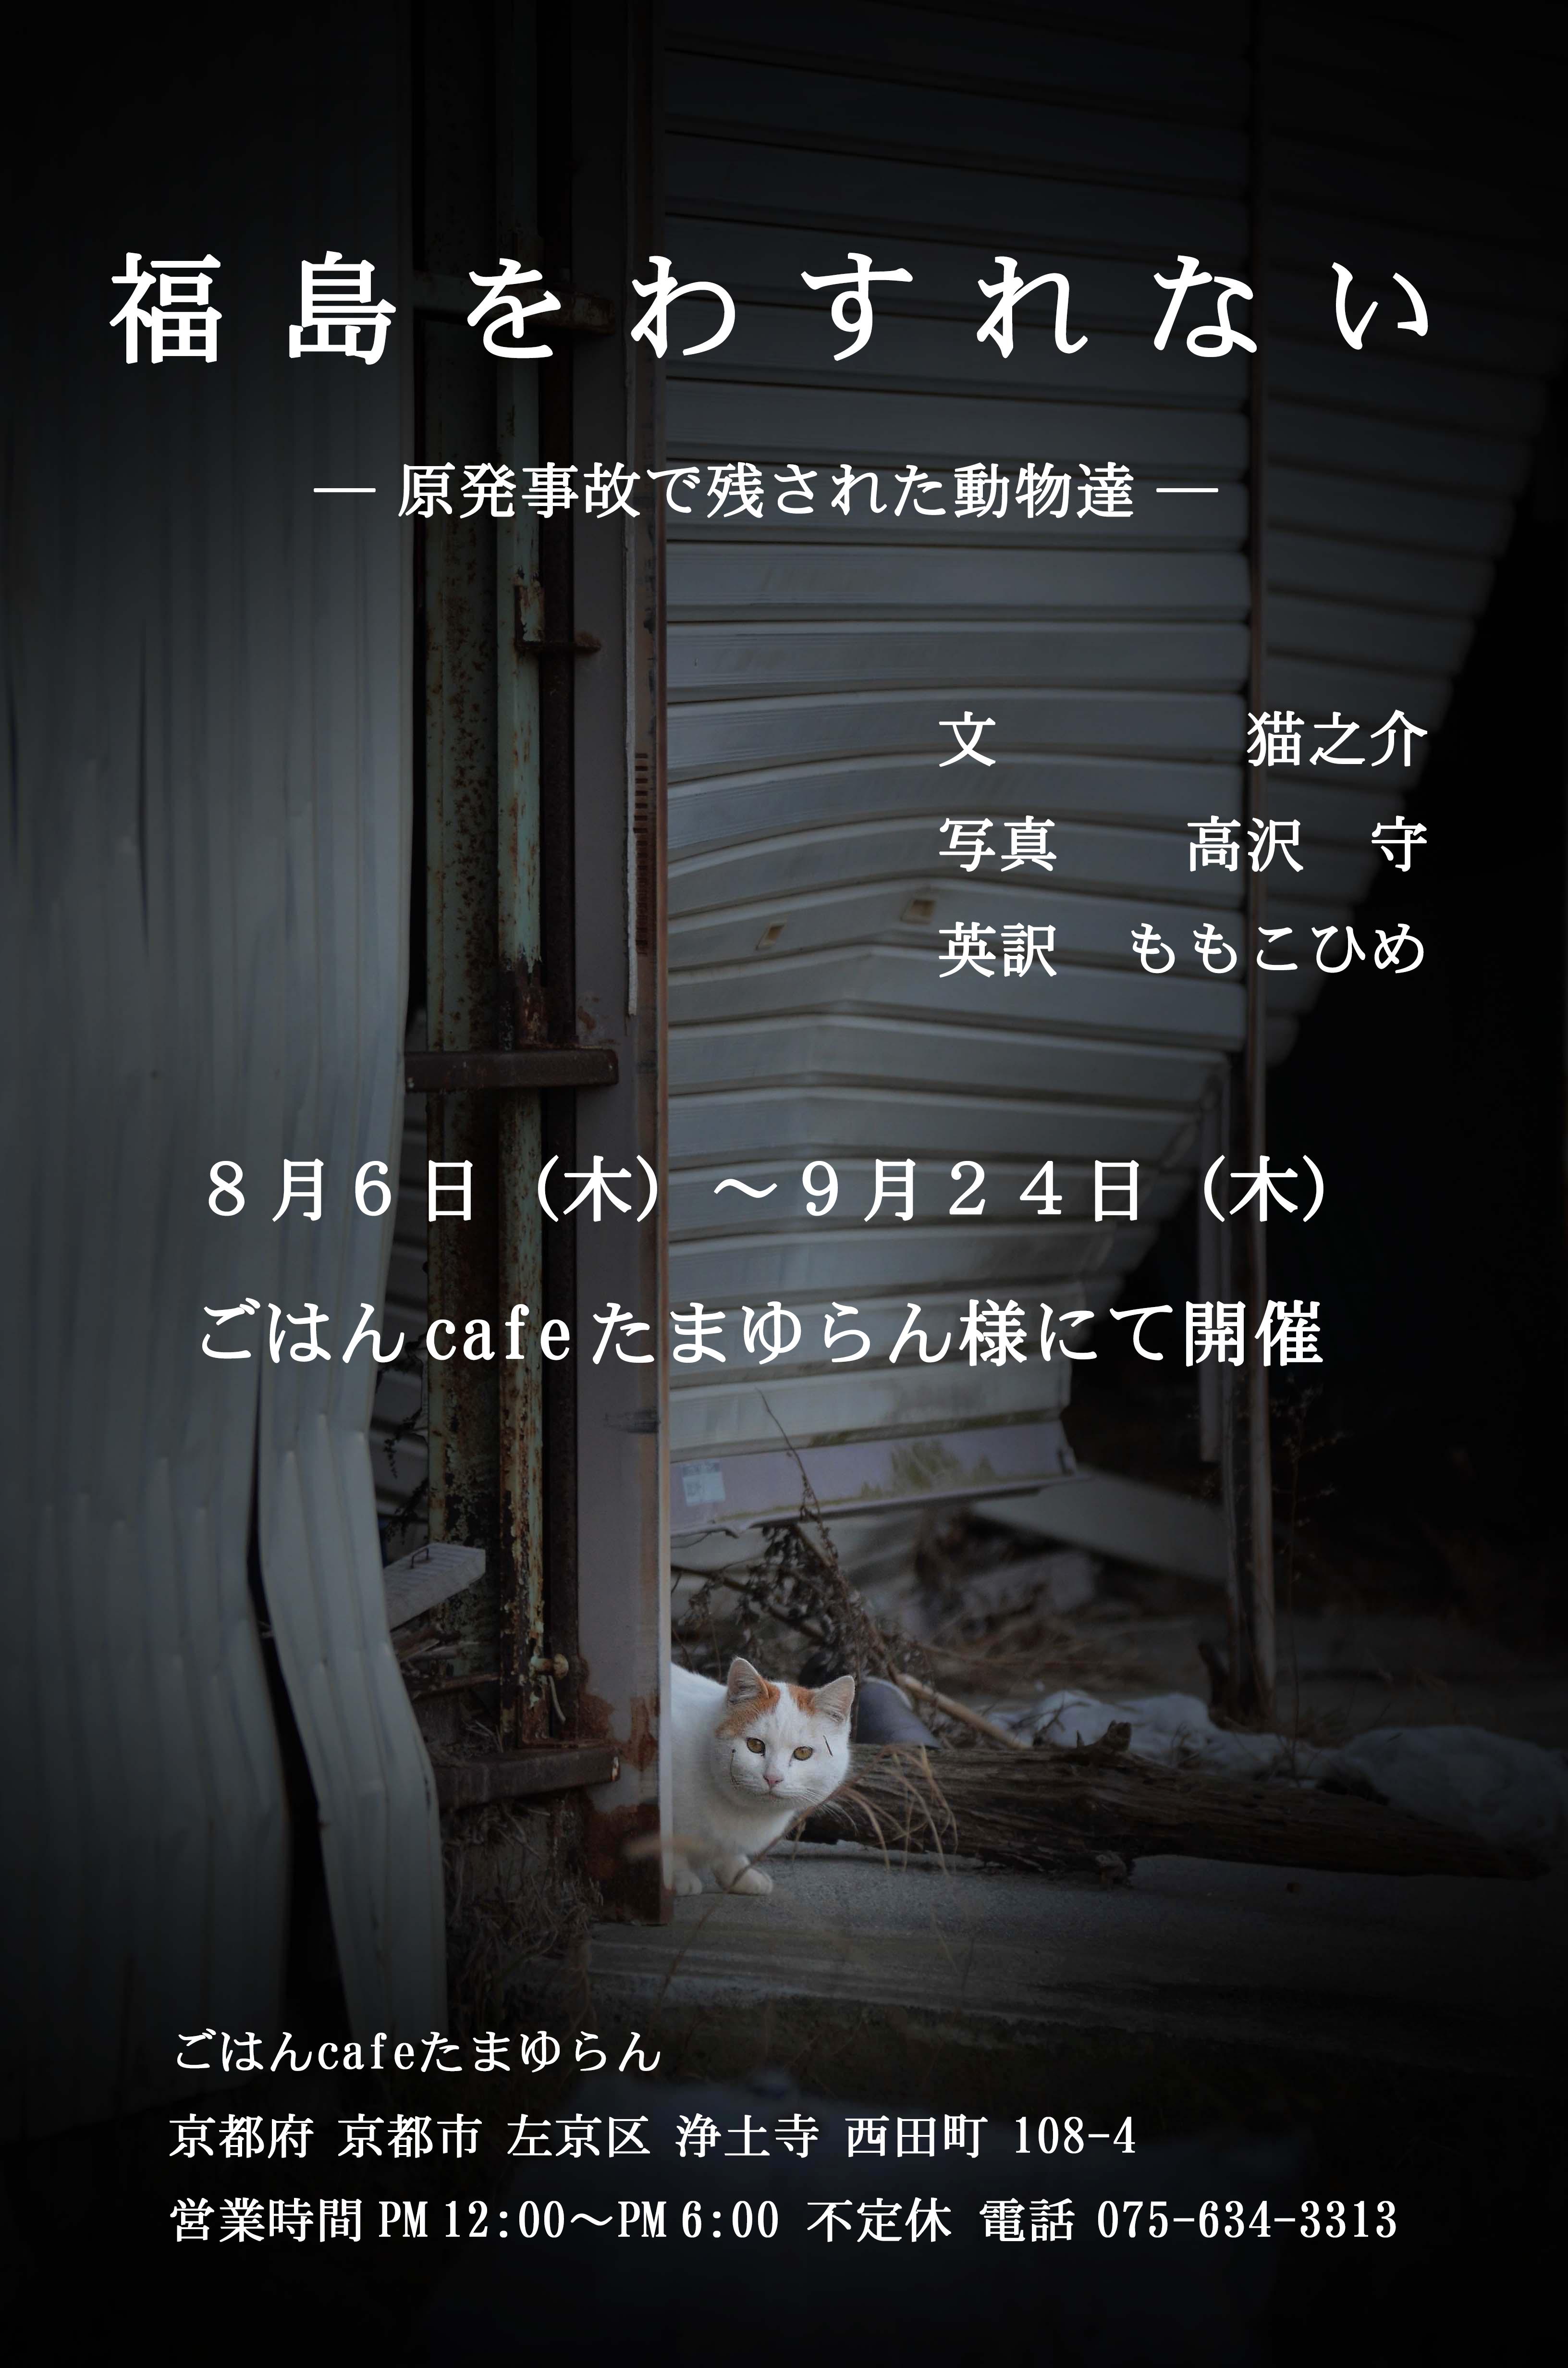 KyotoPanel.jpg